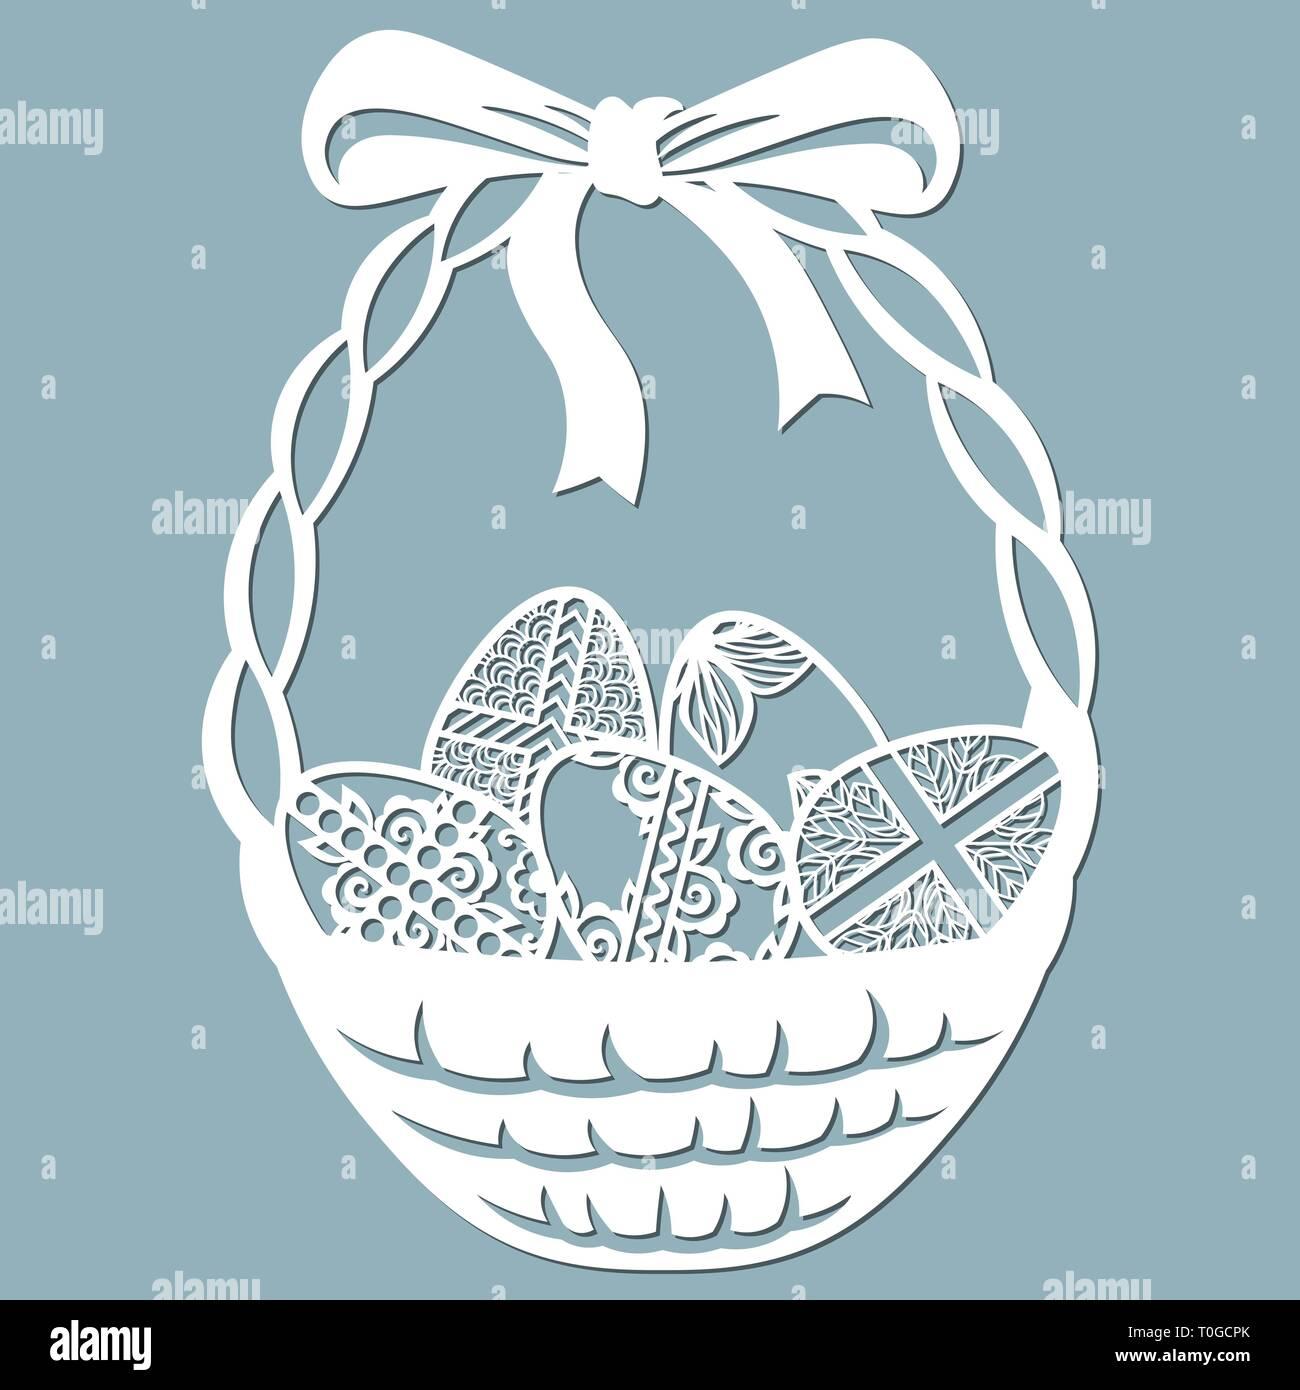 Bow Basket Cross Leaves Flowers Carved In Egg Vector